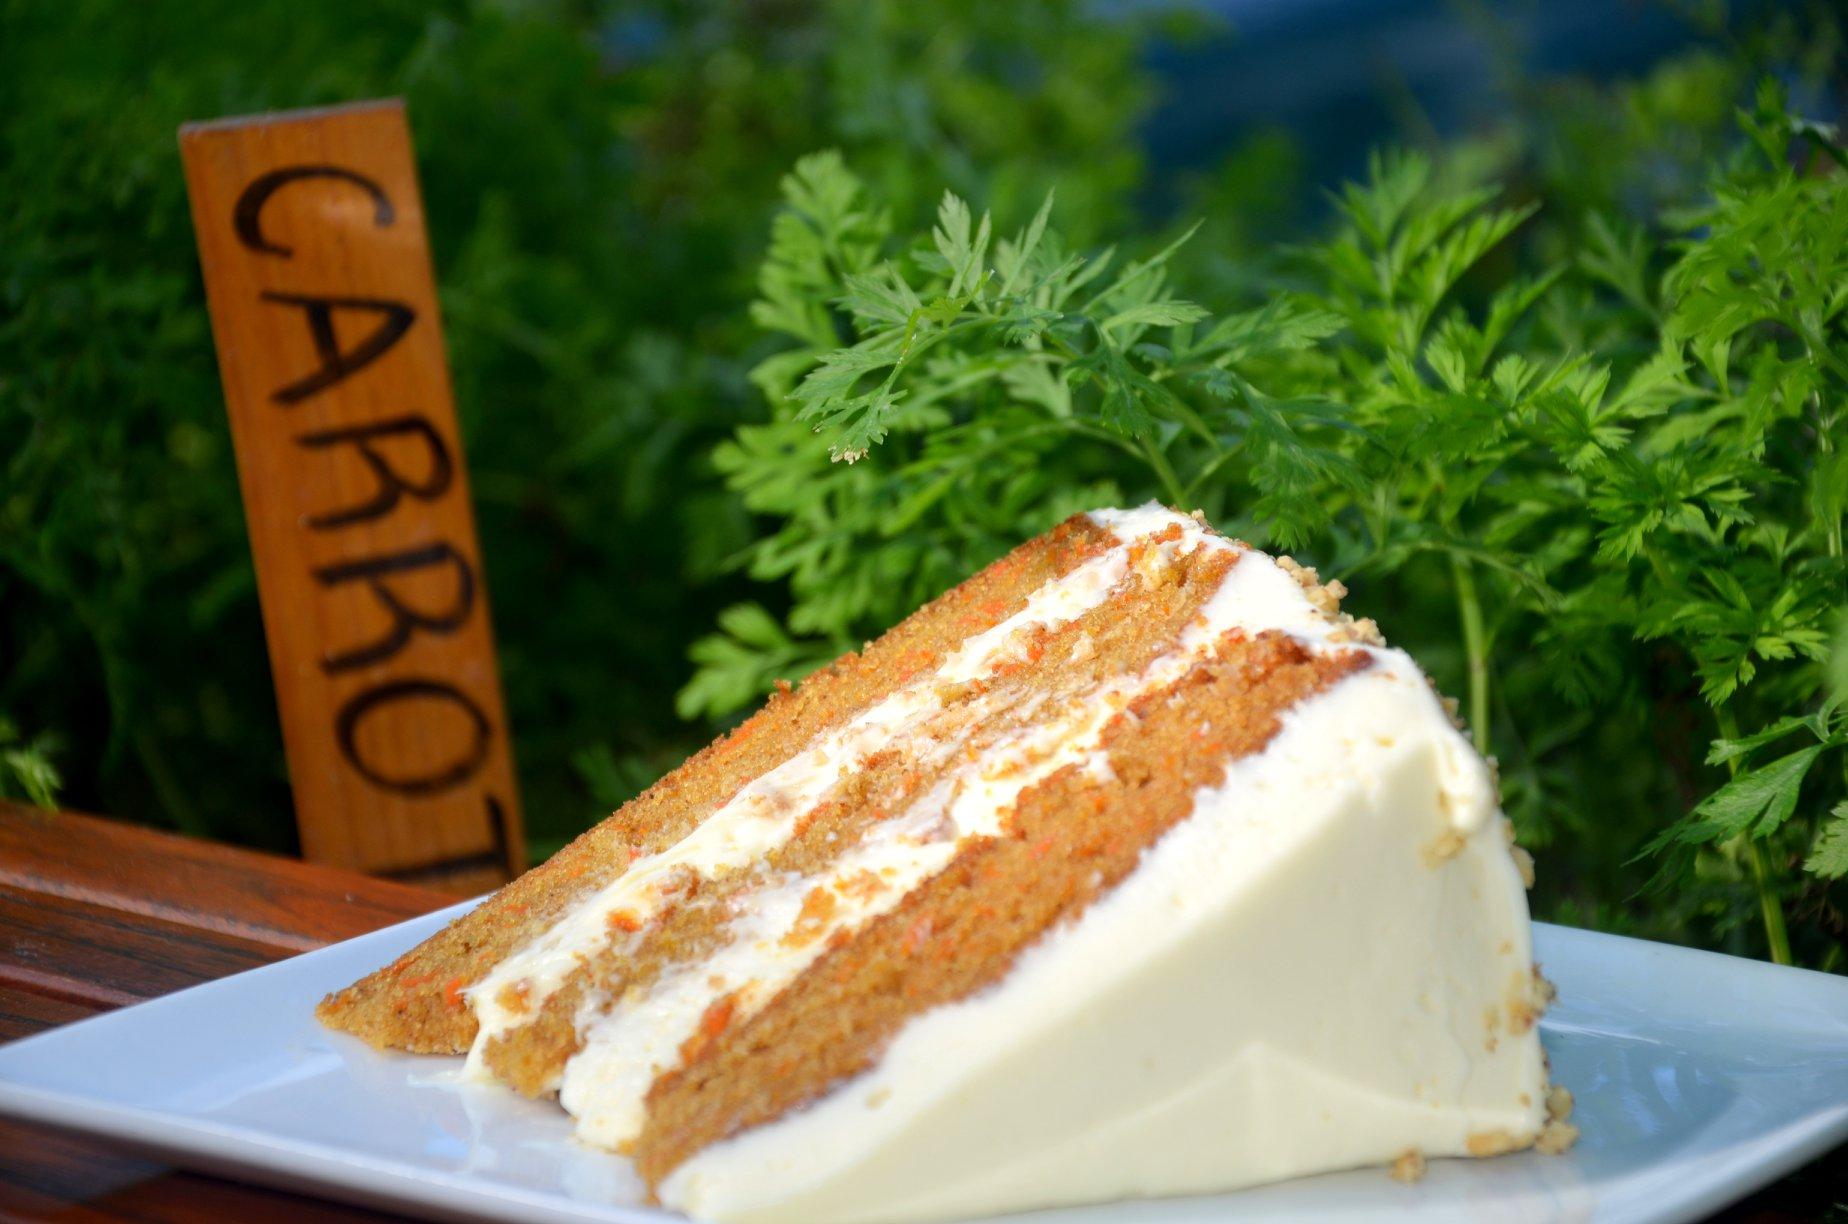 Caboose Carrot Cake Dessert